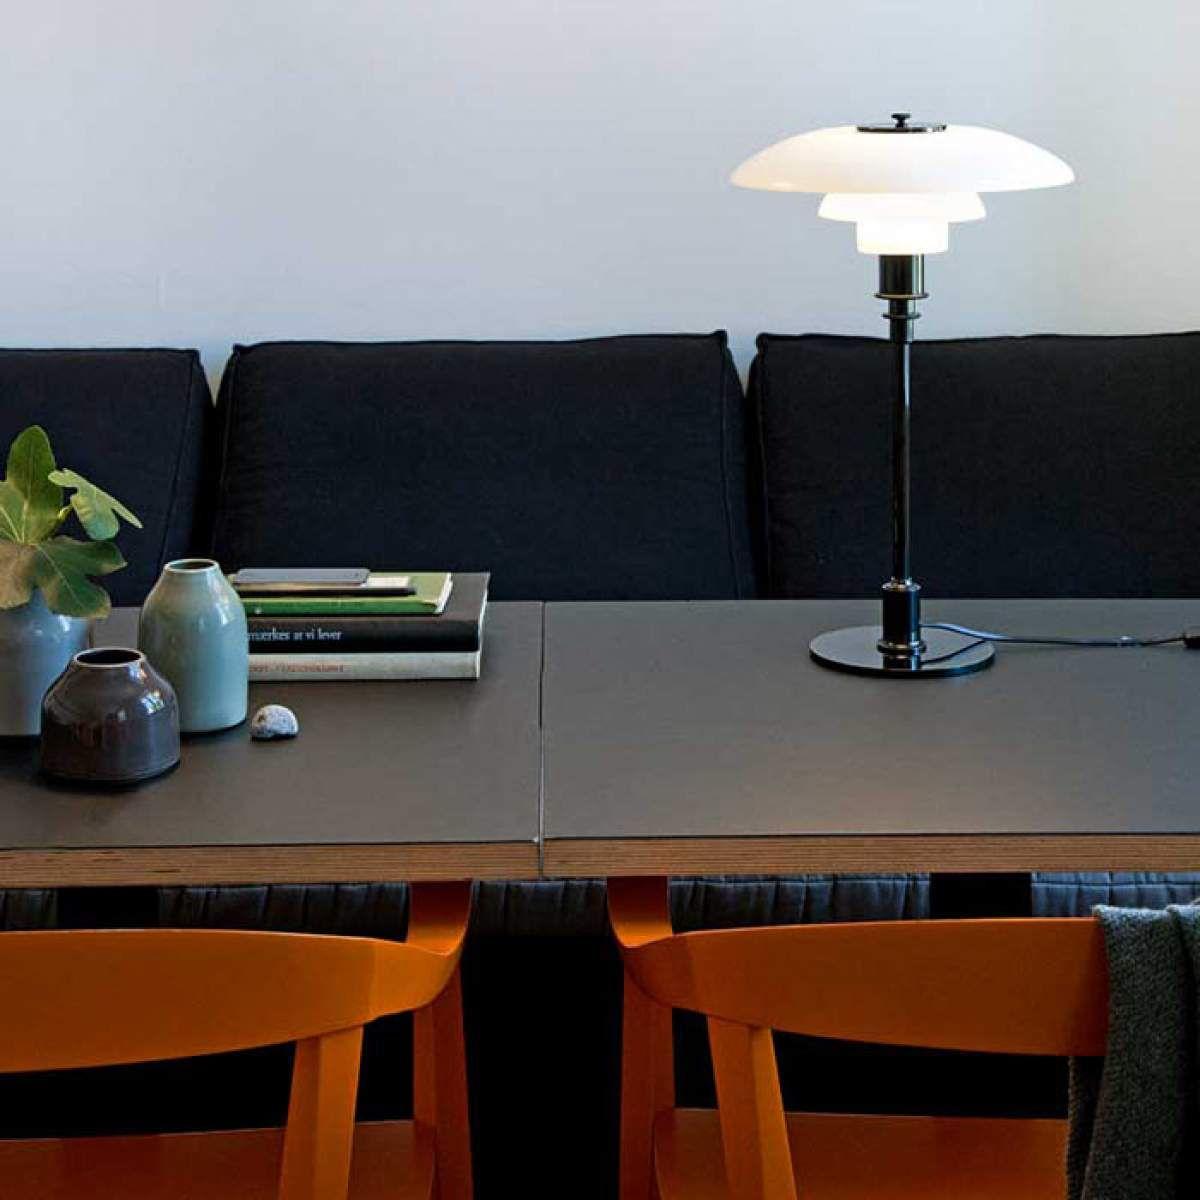 louis poulsen ph 3 2 lampe poser noirelampe poser. Black Bedroom Furniture Sets. Home Design Ideas